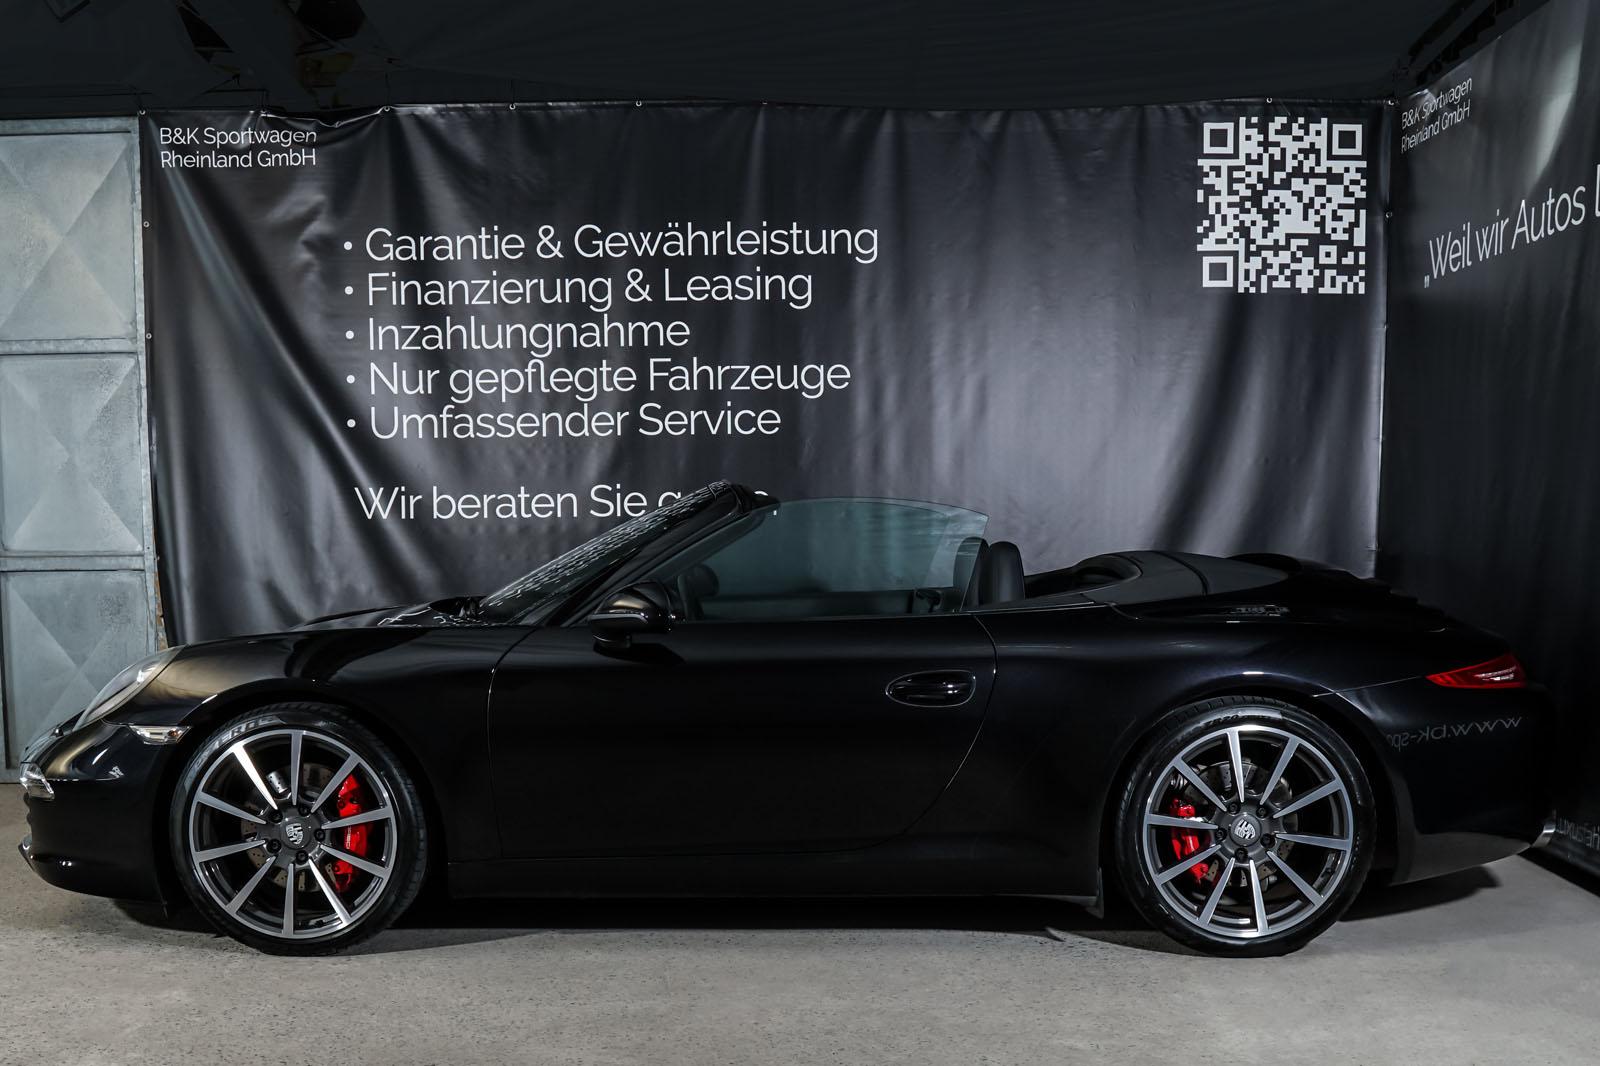 Porsche_991_CarreraS_Cabrio_Schwarz_Schwarz_POR-7555_6_w